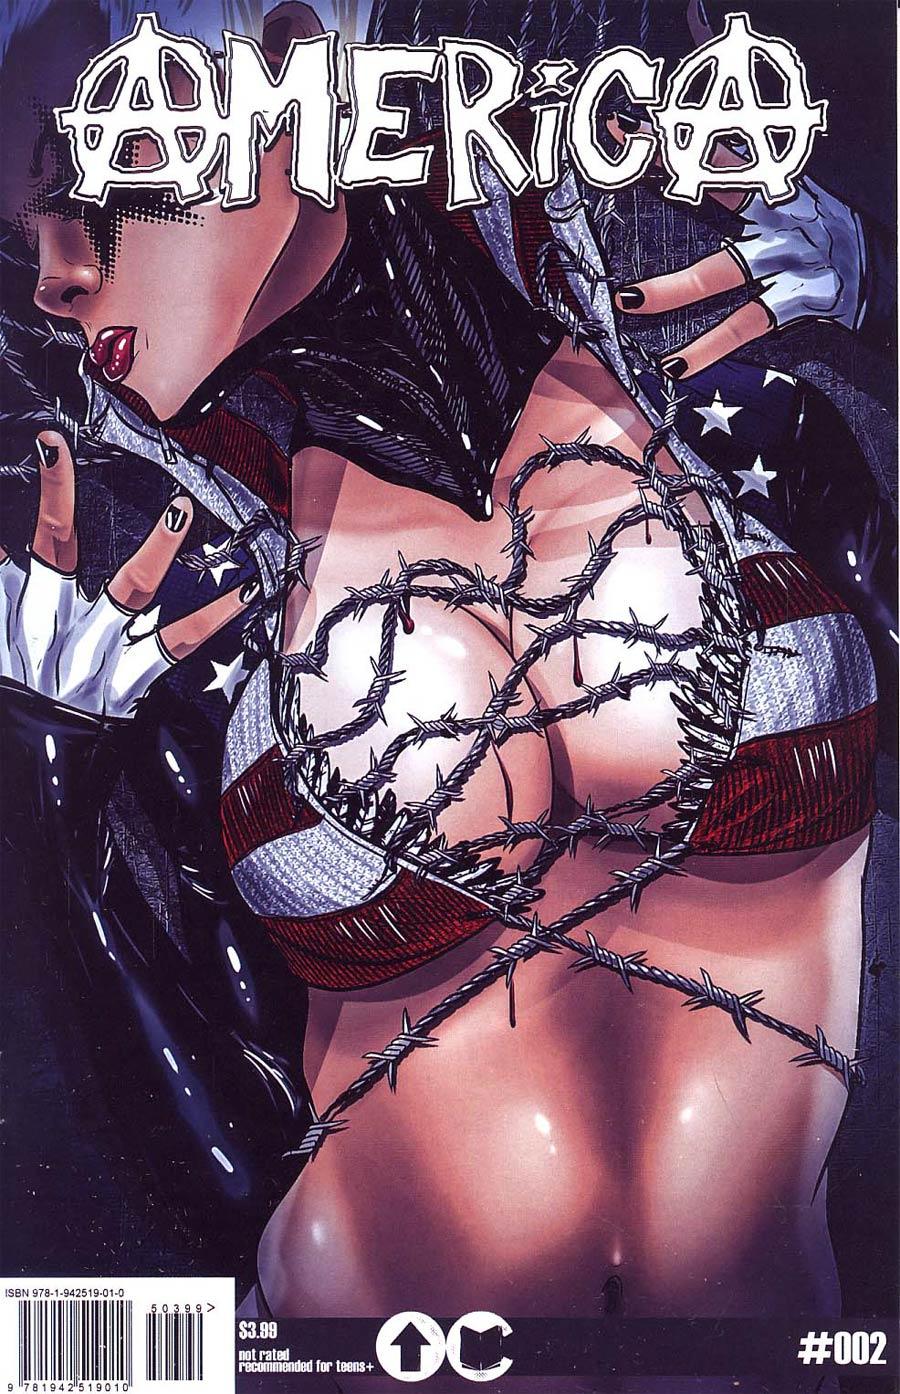 America (Overground Comics) #2